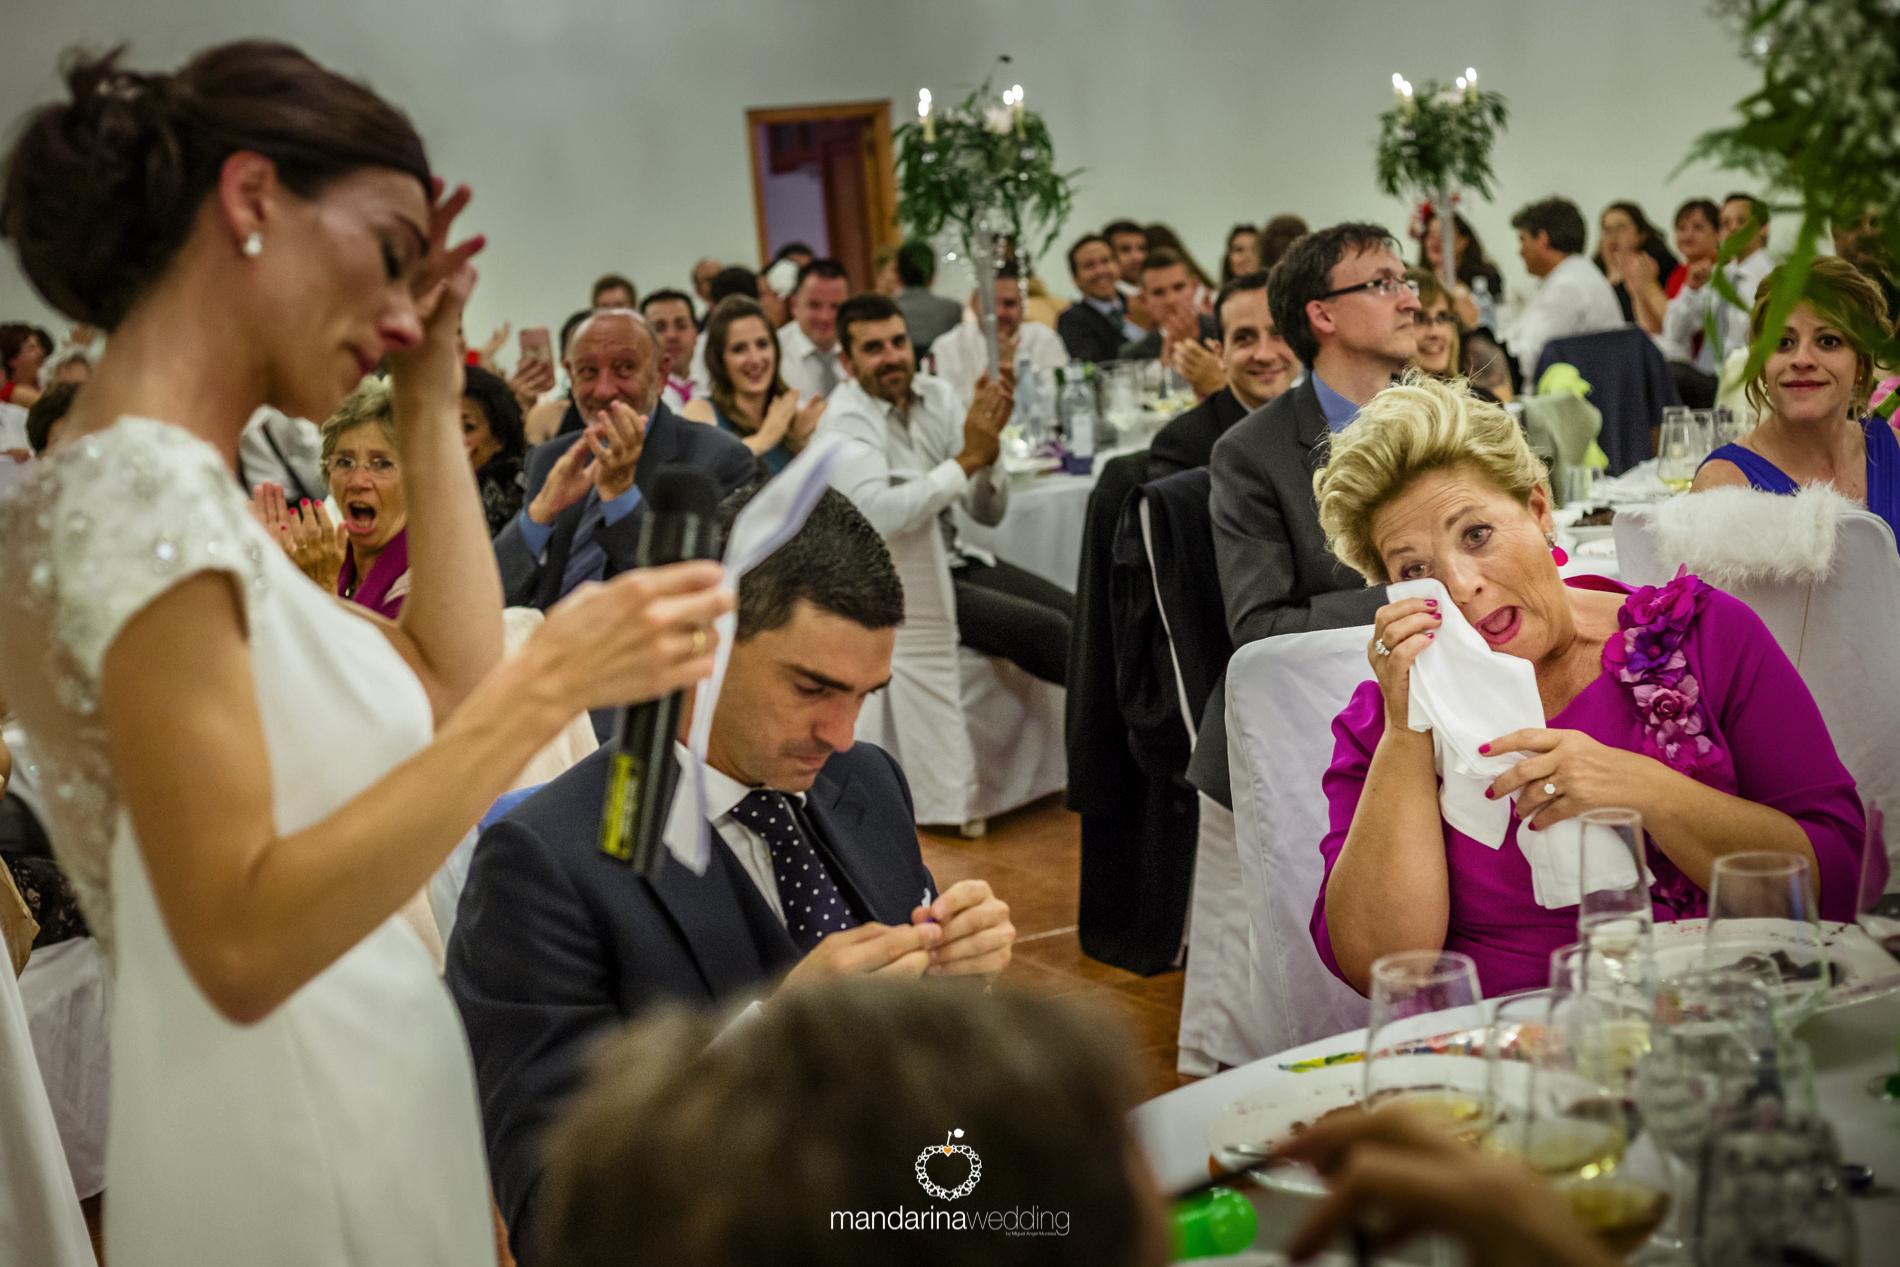 mandaria wedding, fotografos de boda, fotoperiodismo de boda, mejores fotografos de boda, bodas soria, bodas pirineo, bodas Madrid, fotógrafos tarragona_20